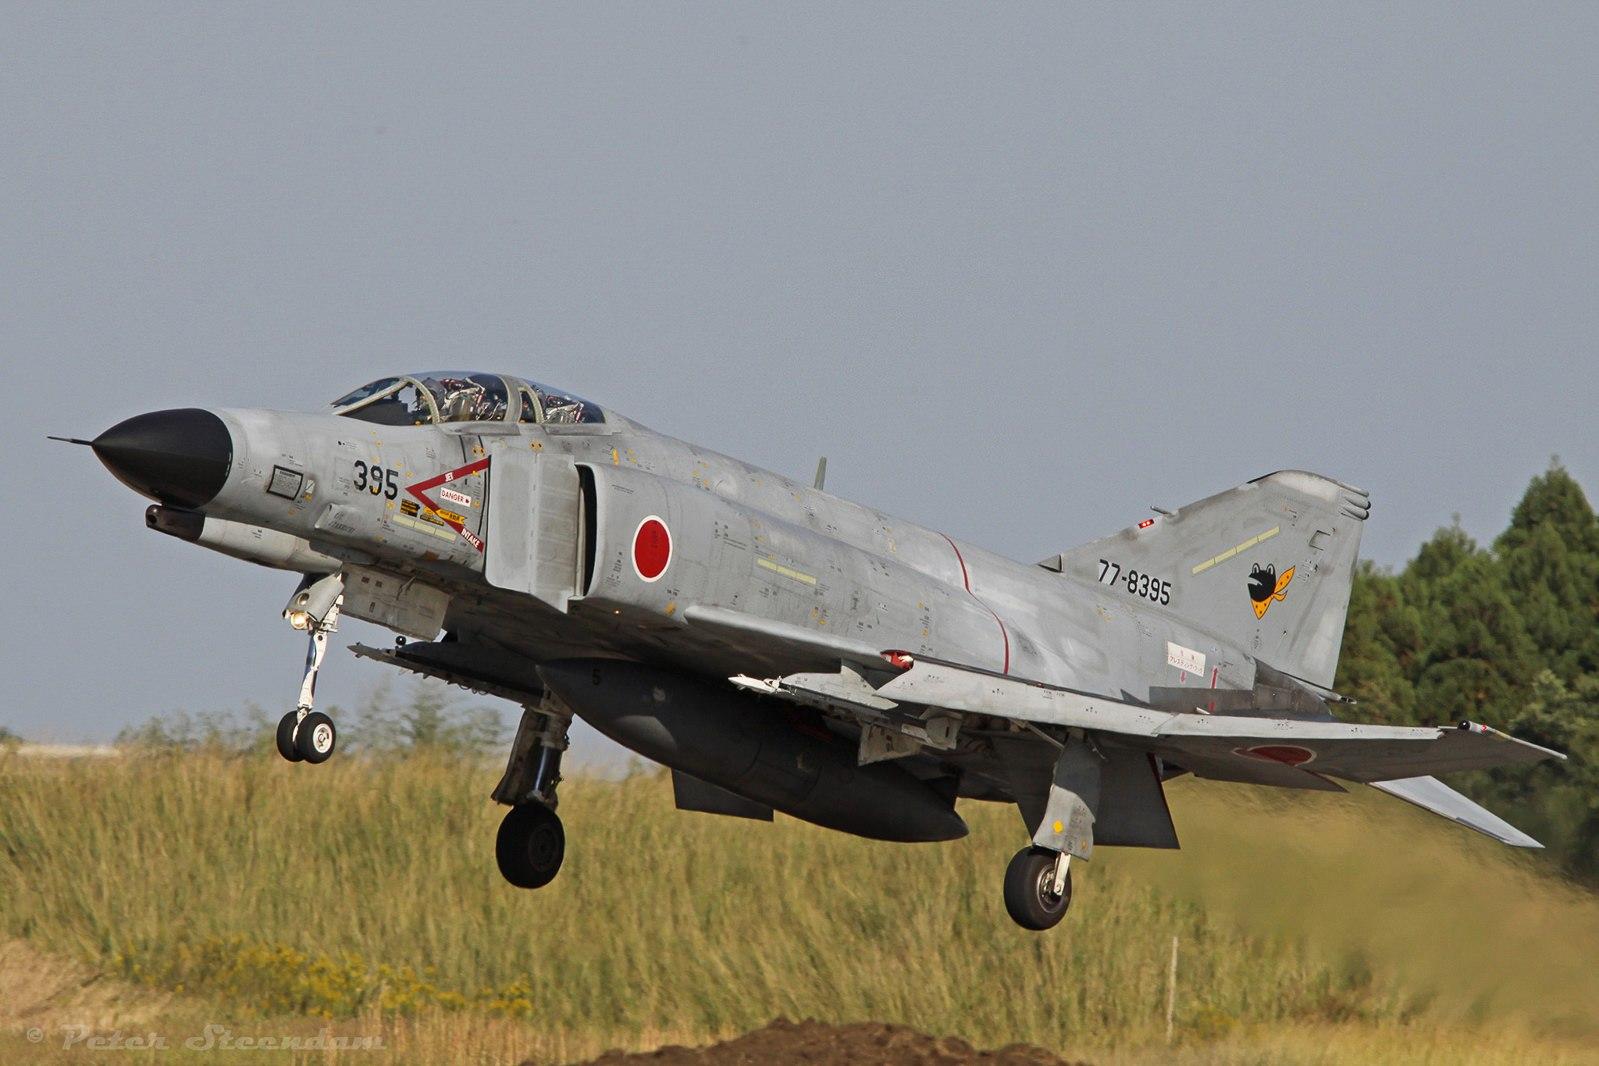 f-4ej-77-8395-301-tfs-landing_mod_fb